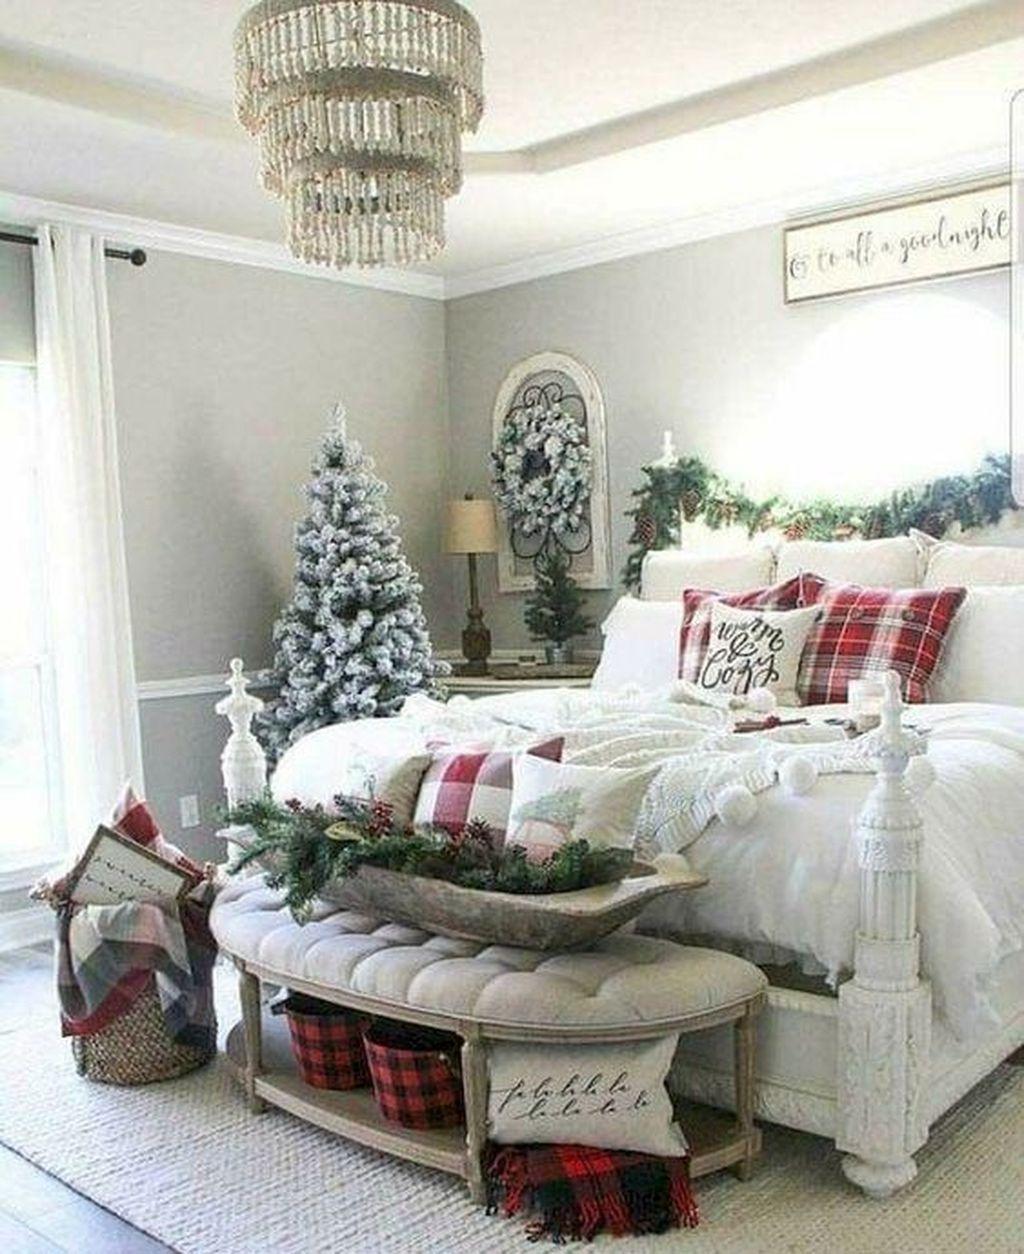 21 Cosy Winter Bedroom Ideas: 50 Amazing Winter Home Decoration Ideas In 2020